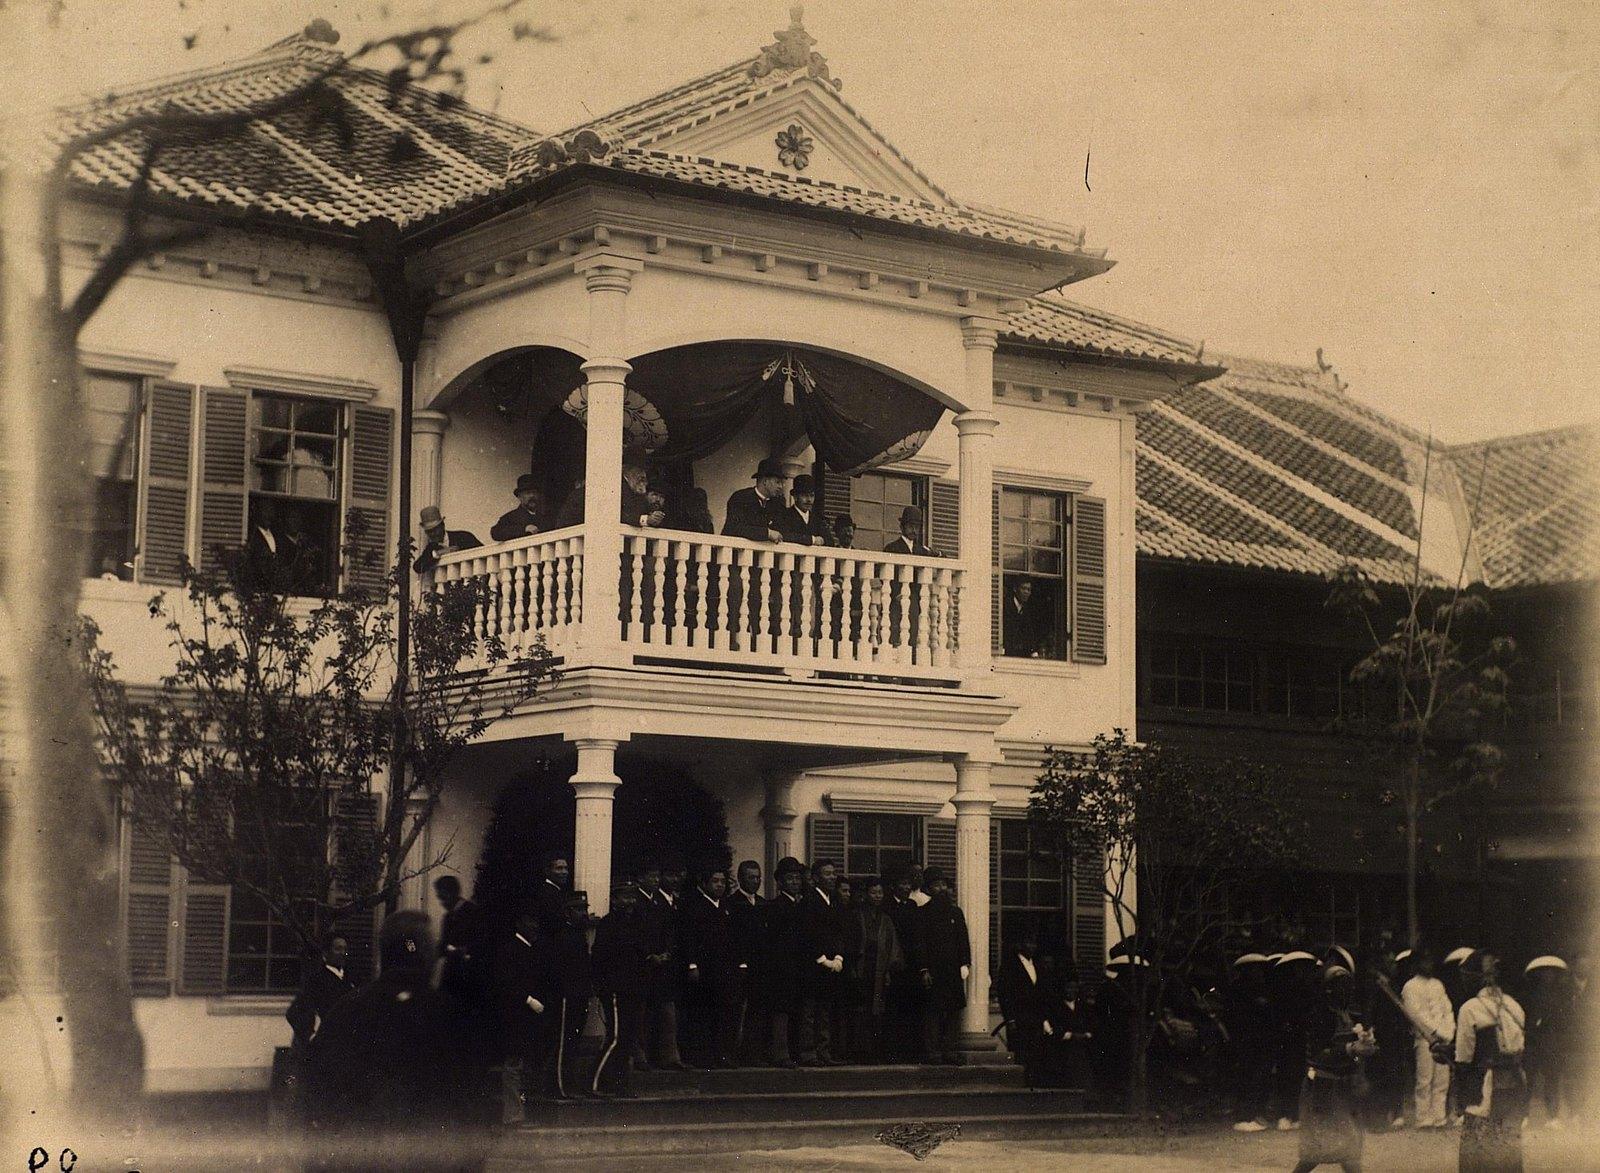 07. 1891. Кагосима. Цесаревич Николай Александрович наблюдает парад самураев с веранды